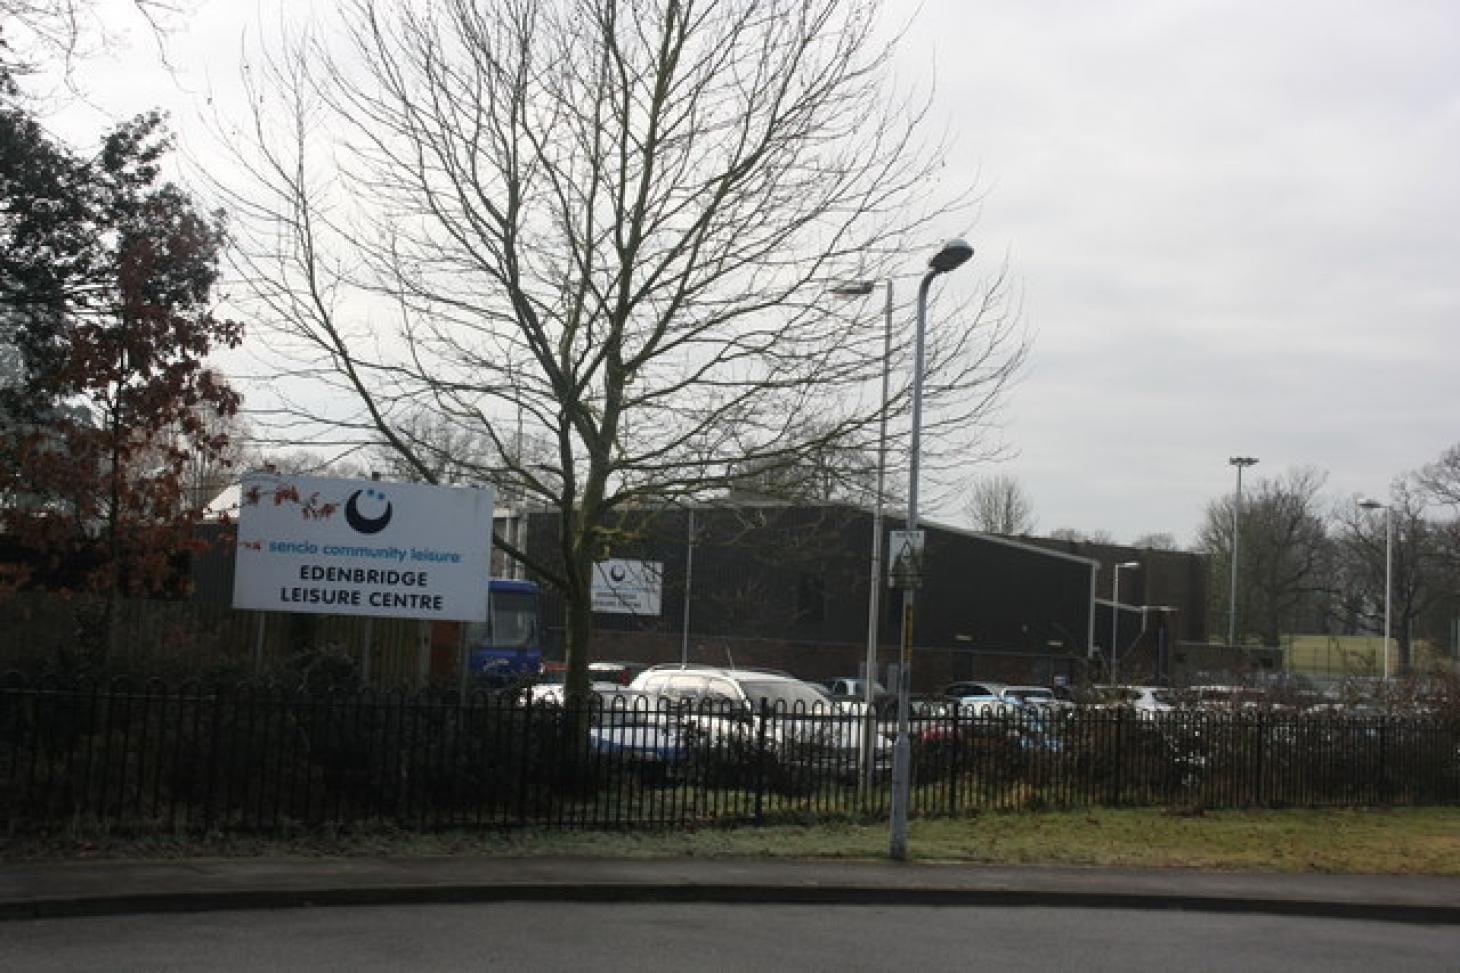 Edenbridge Leisure Centre 5 a side | Astroturf football pitch